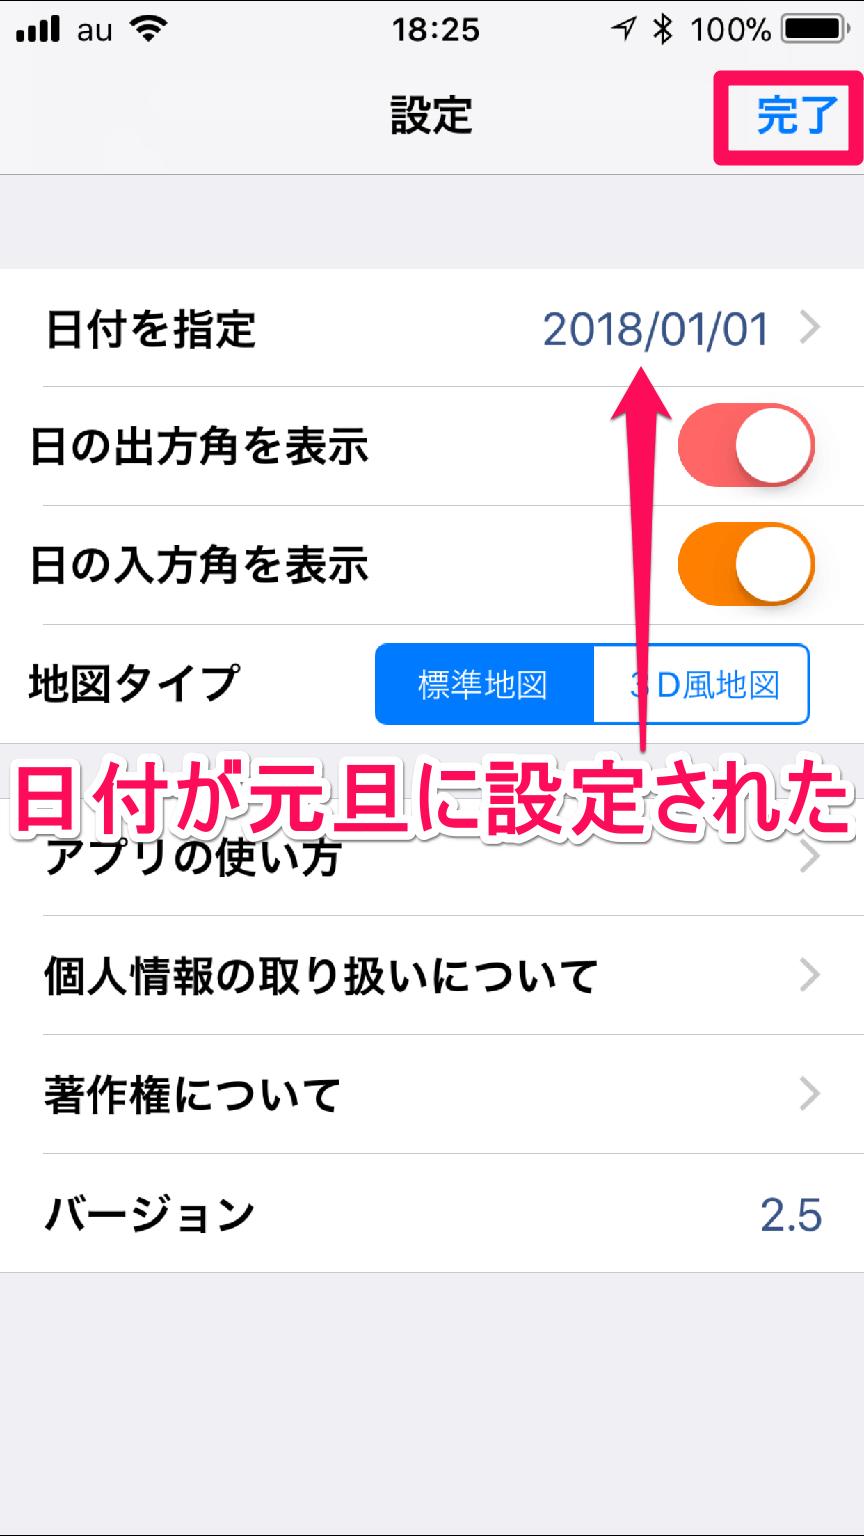 iPhone版[日の出日の入マピオン]アプリで日付を元旦に指定した[設定]画面